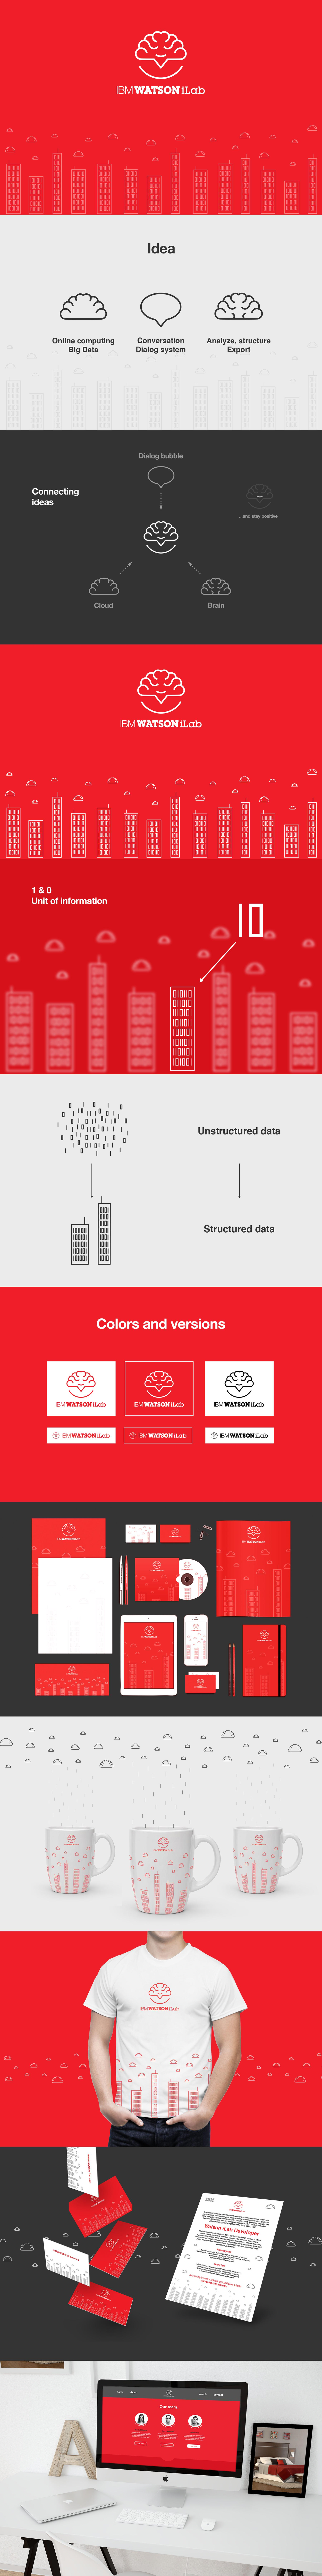 IBM Watson iLab on Behance